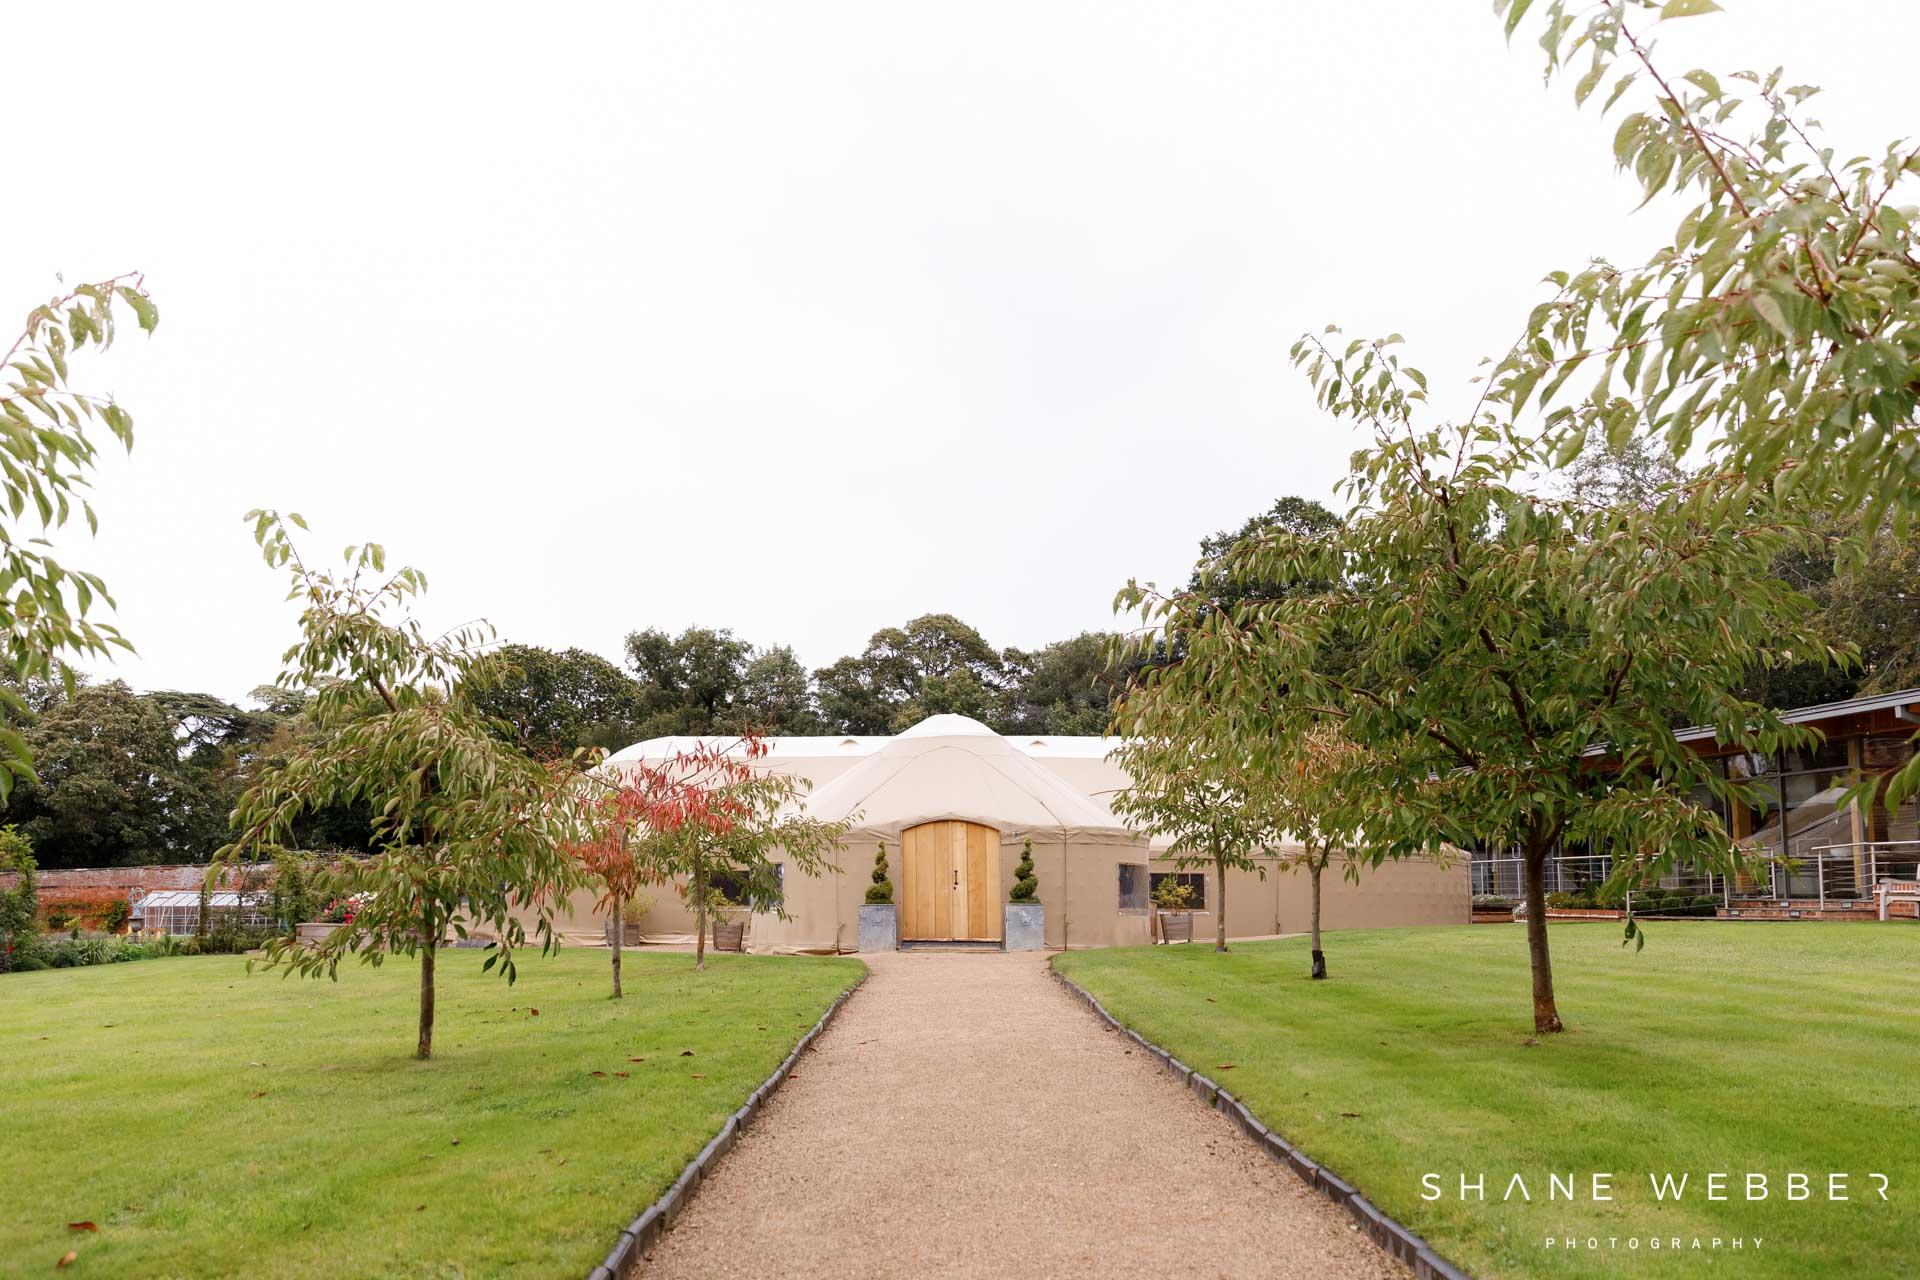 Thorpe Garden wedding yurt